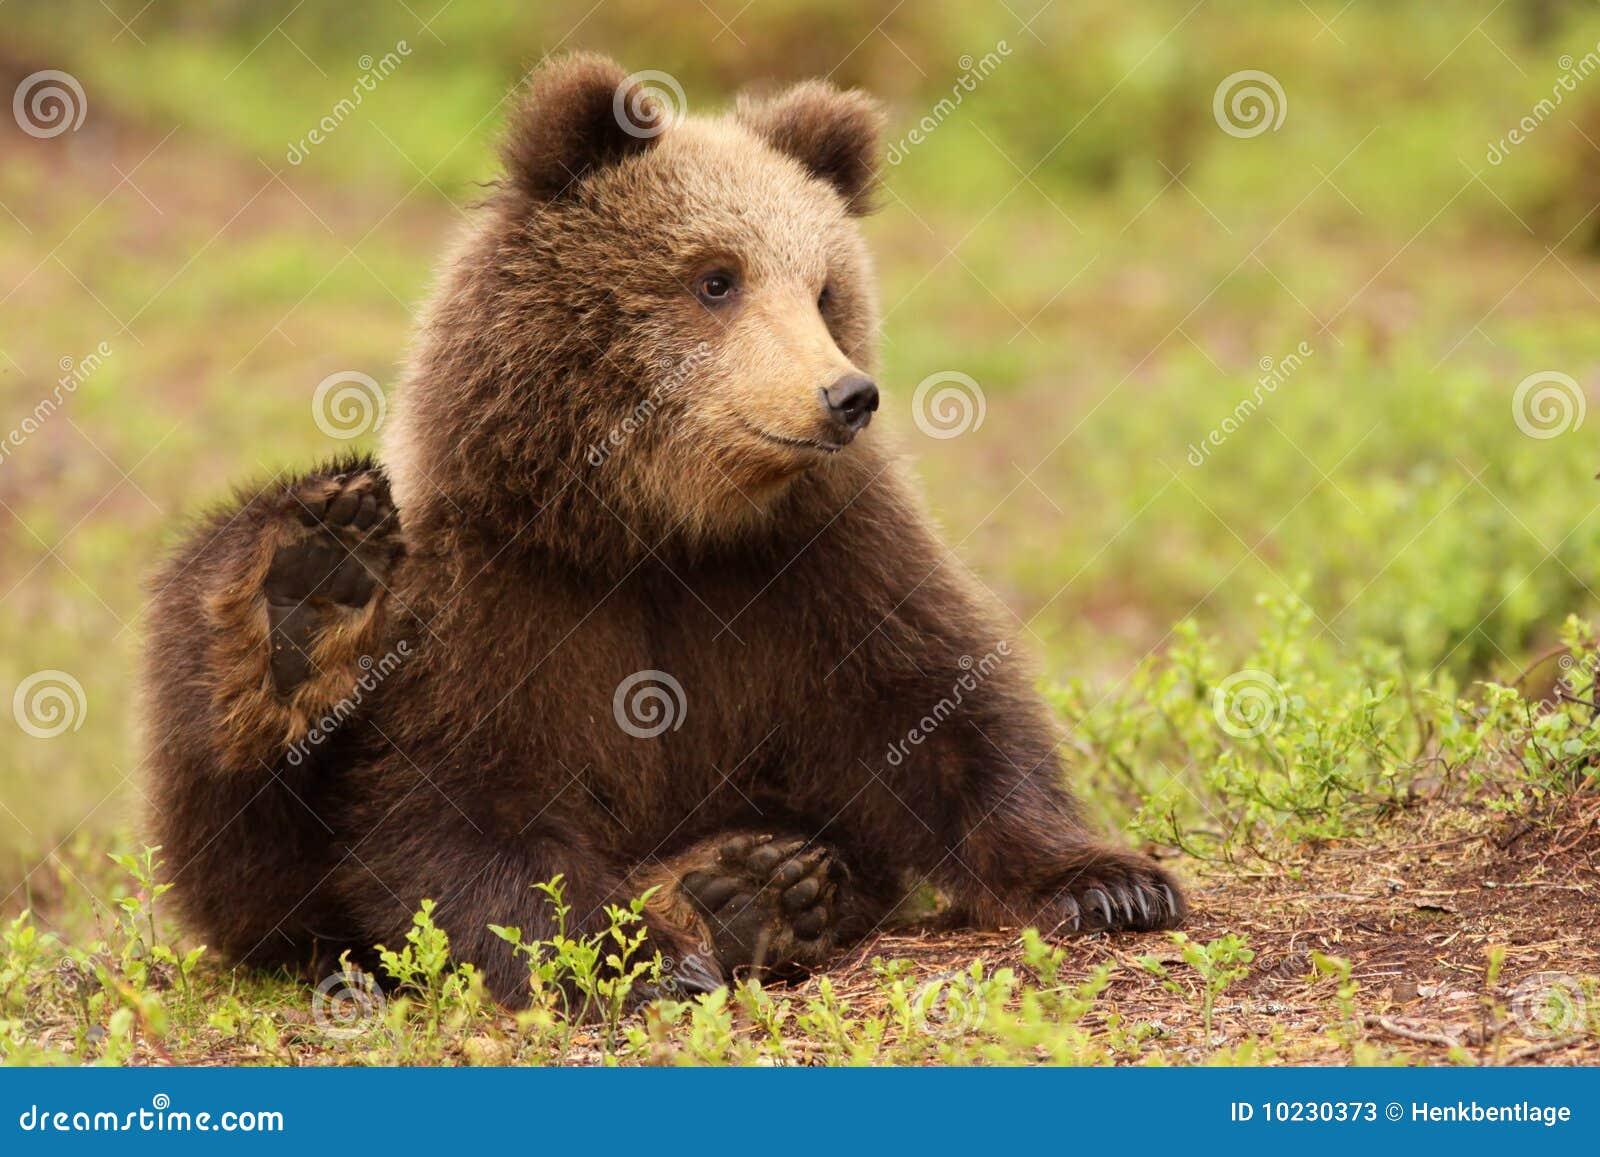 petit animal d 39 ours brun mignon image stock image du ours fourrure 10230373. Black Bedroom Furniture Sets. Home Design Ideas